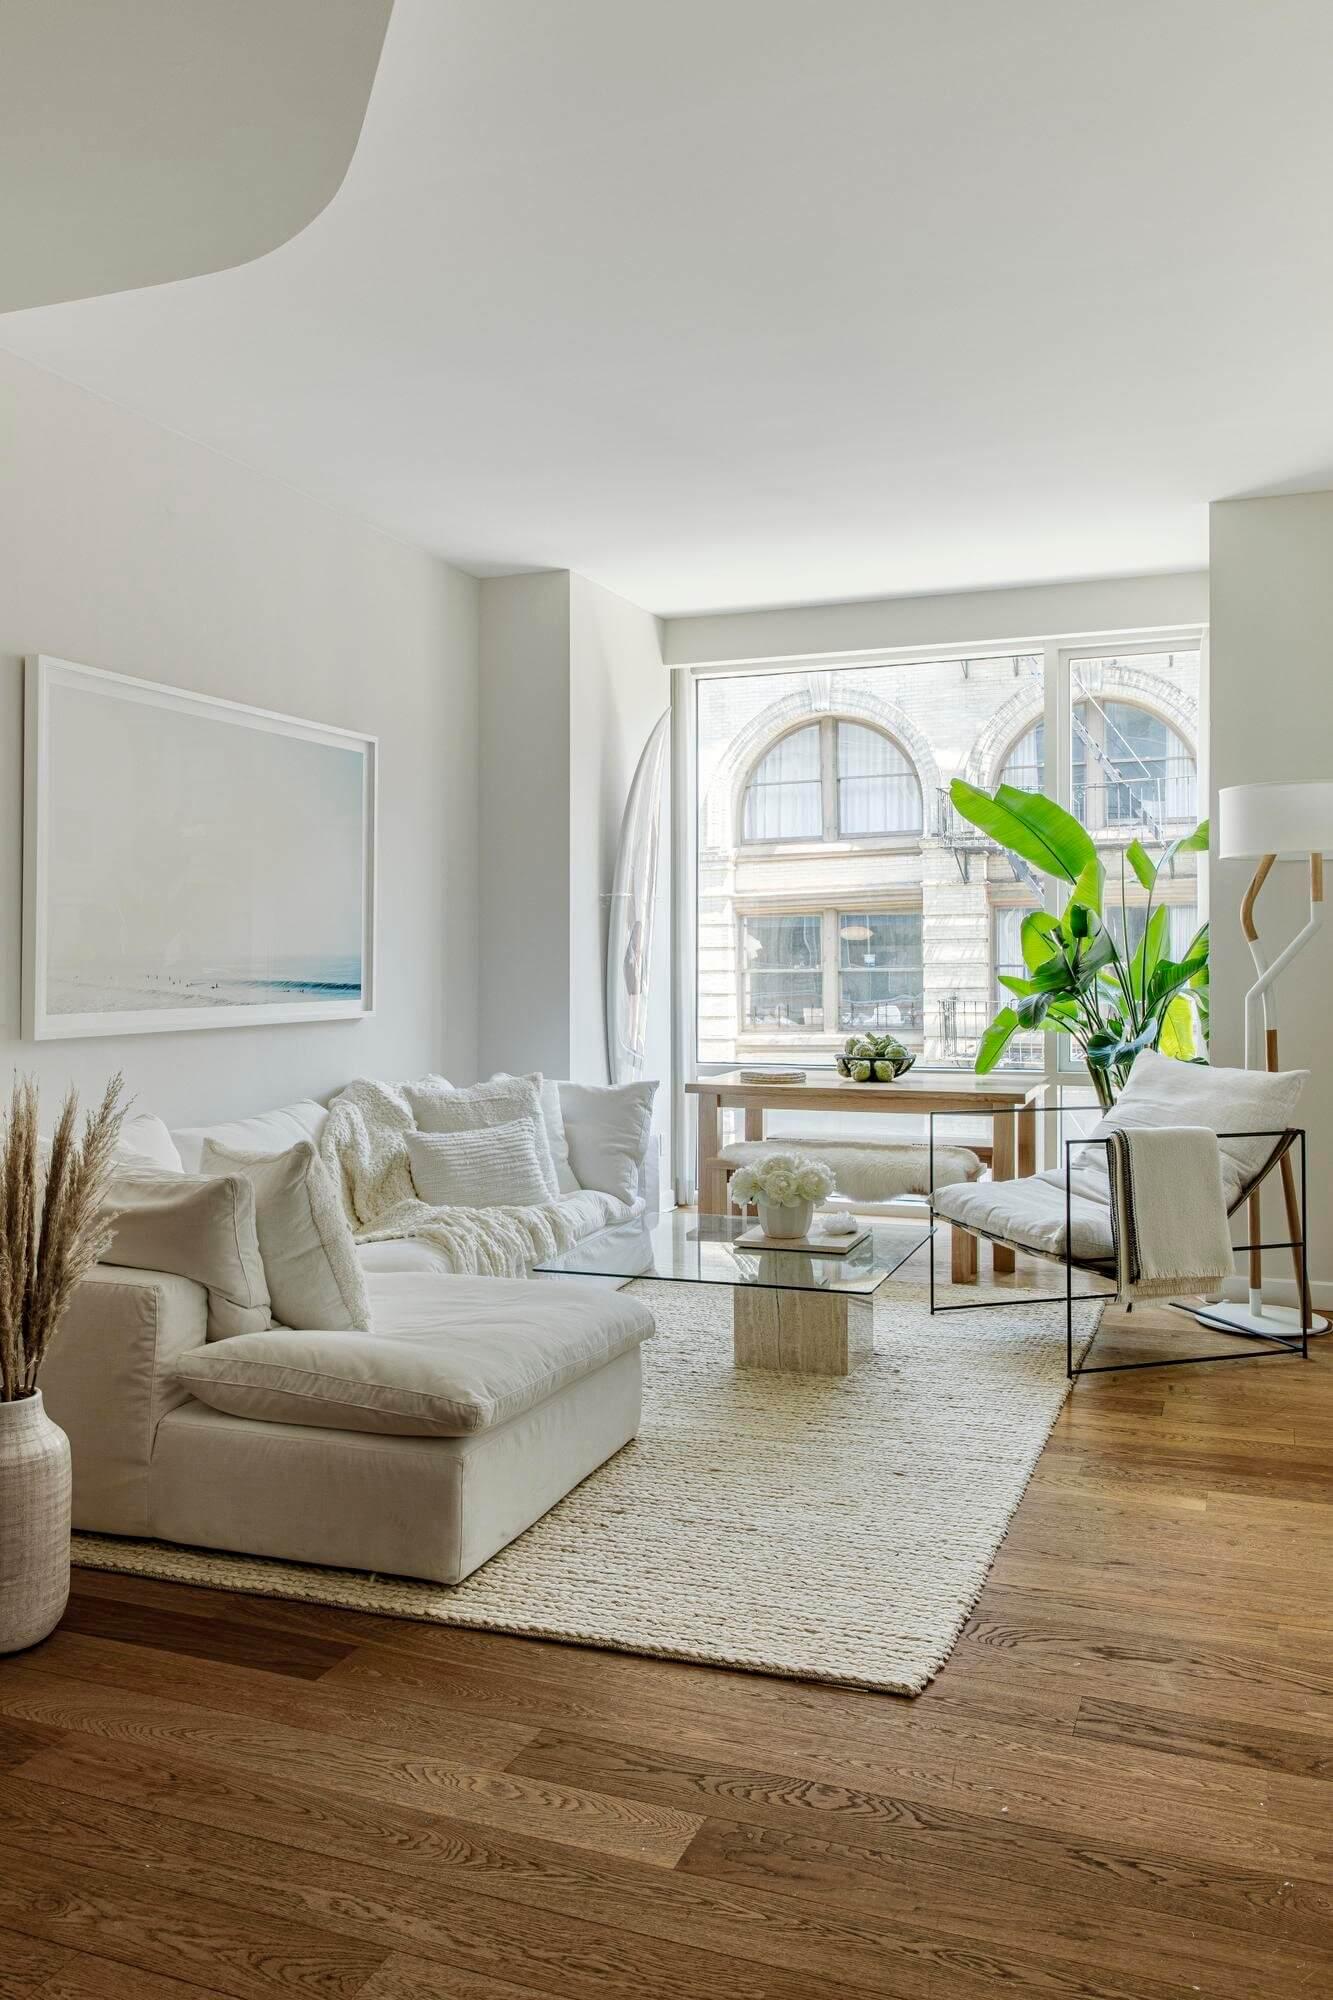 Calm Neutral Tones in a New York Apartment